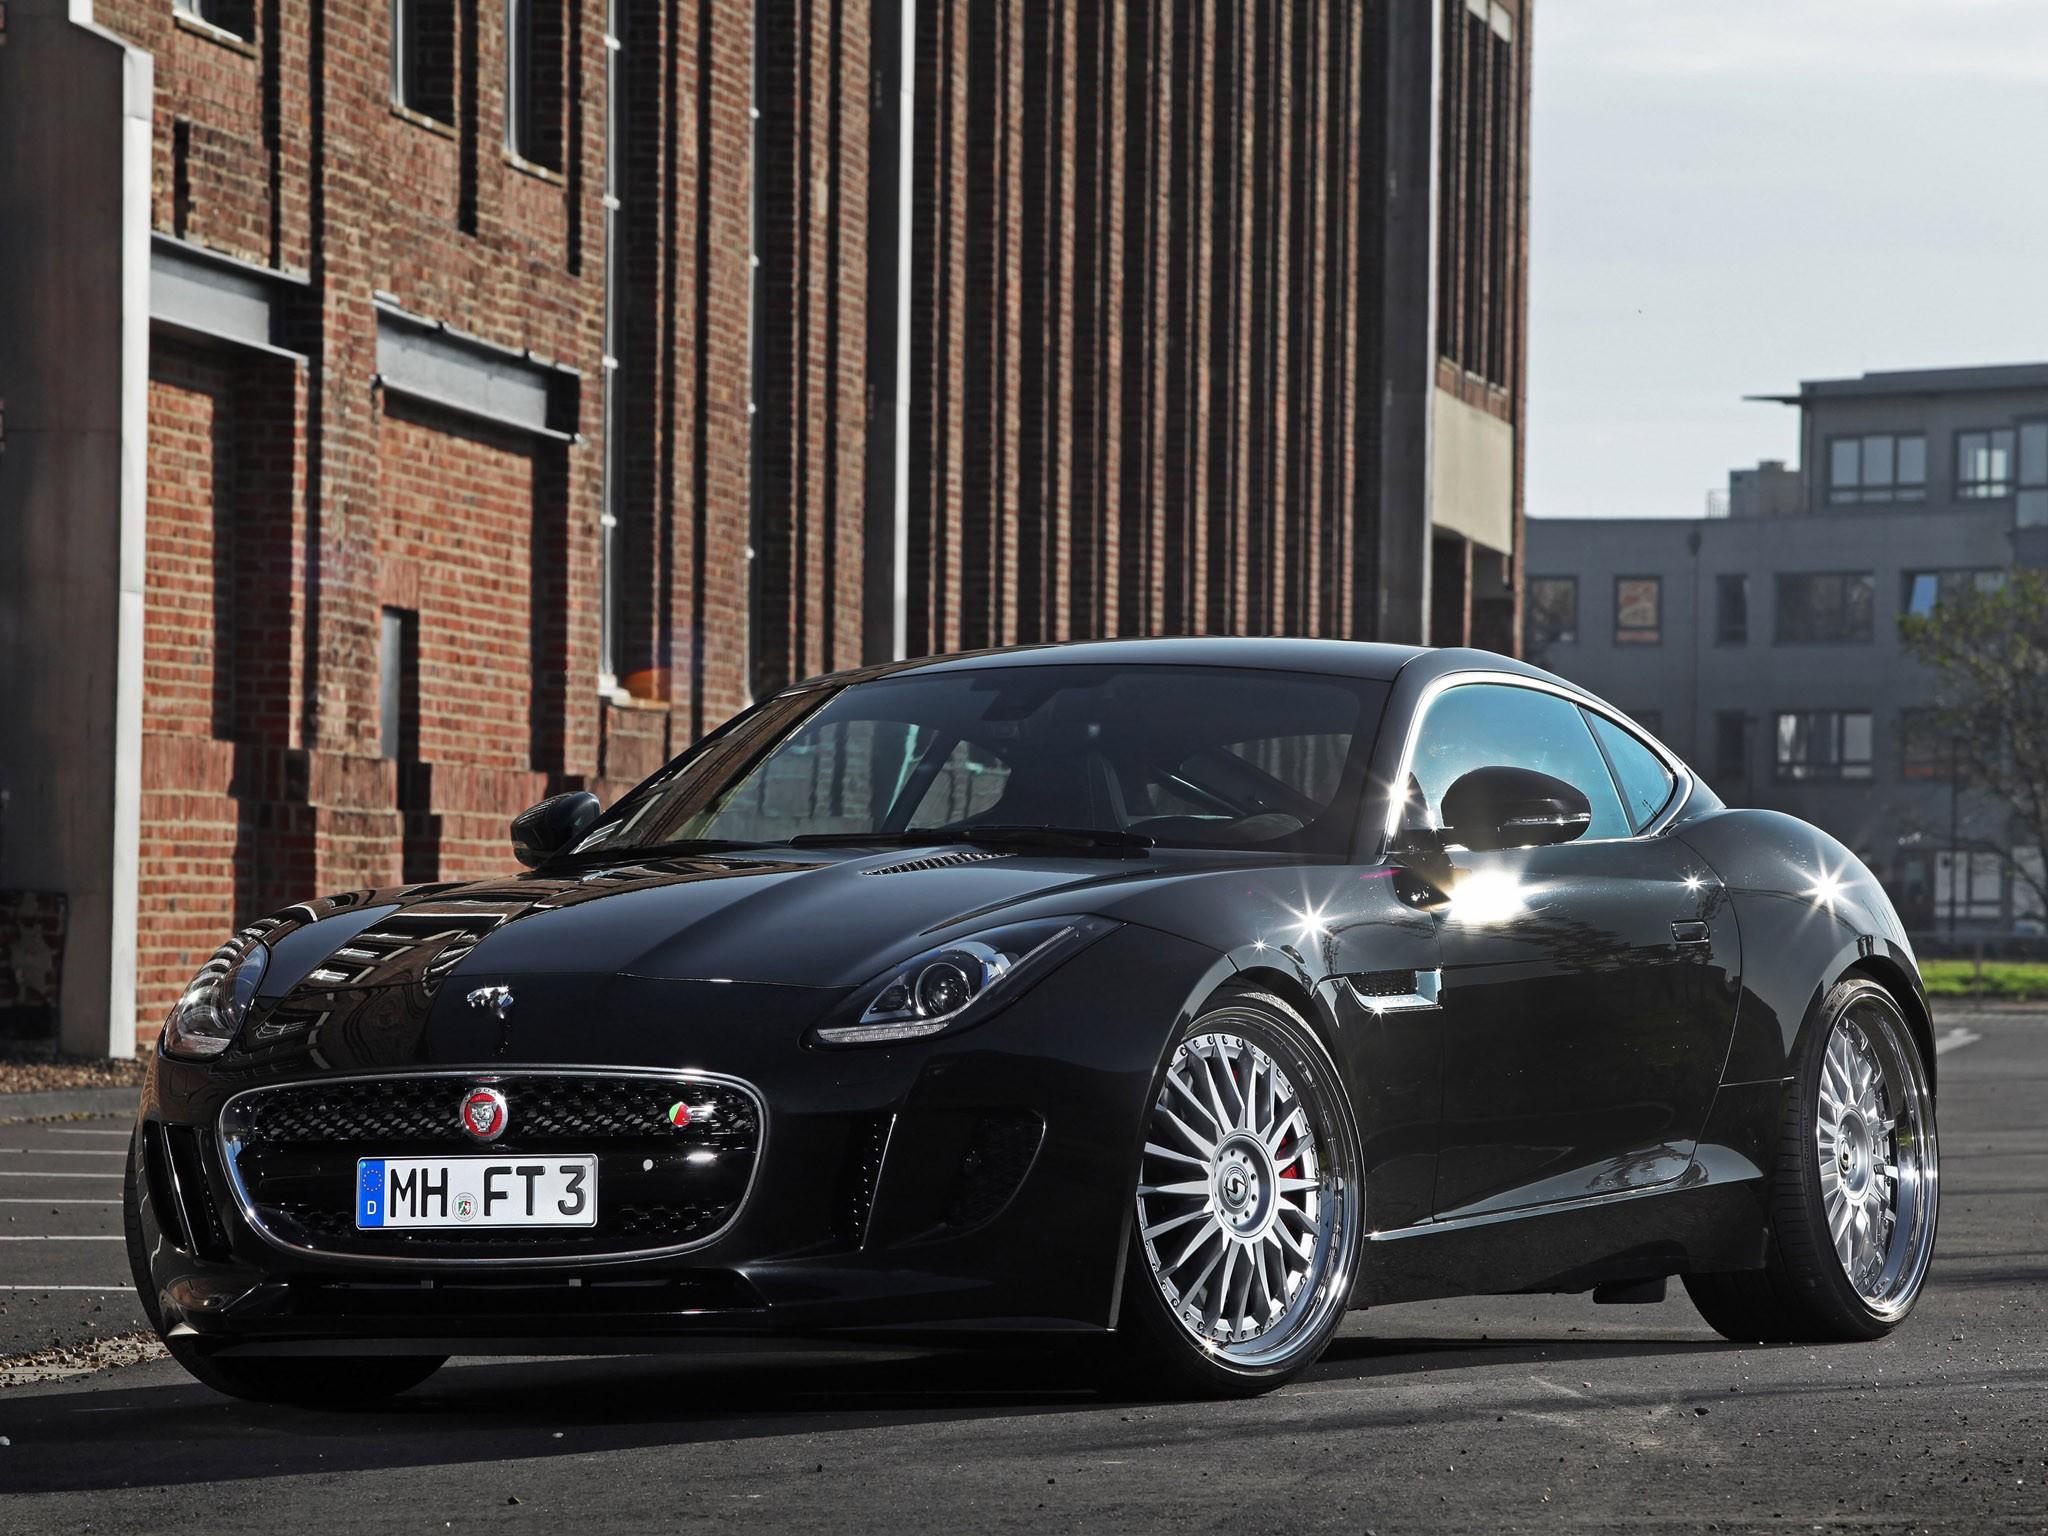 2014 Schmidt Revolution Jaguar F-Type Coupe